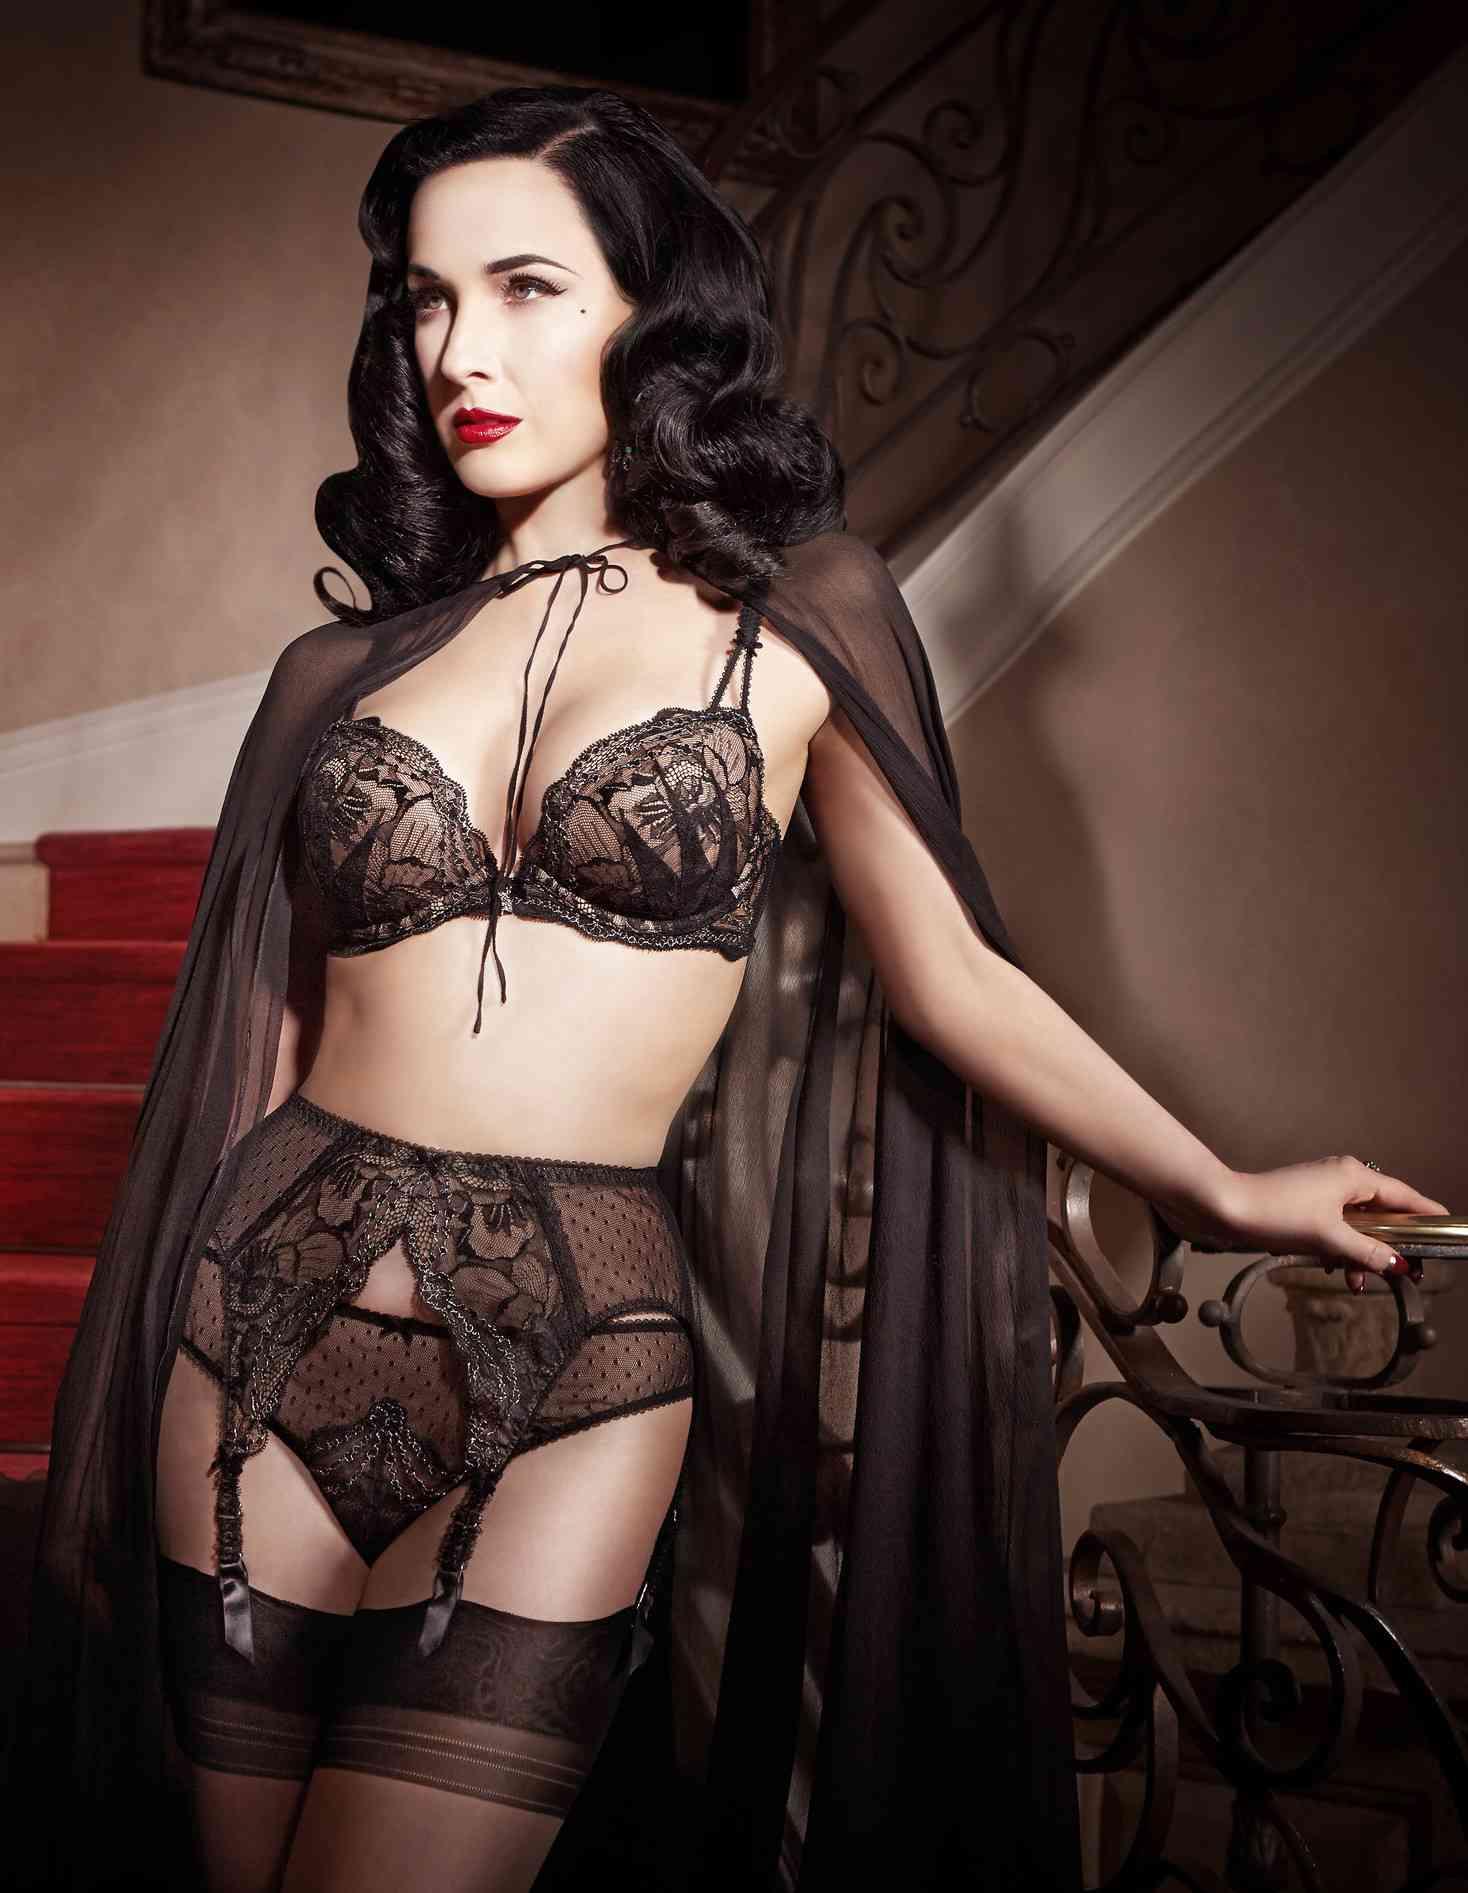 Dita Von Teese model